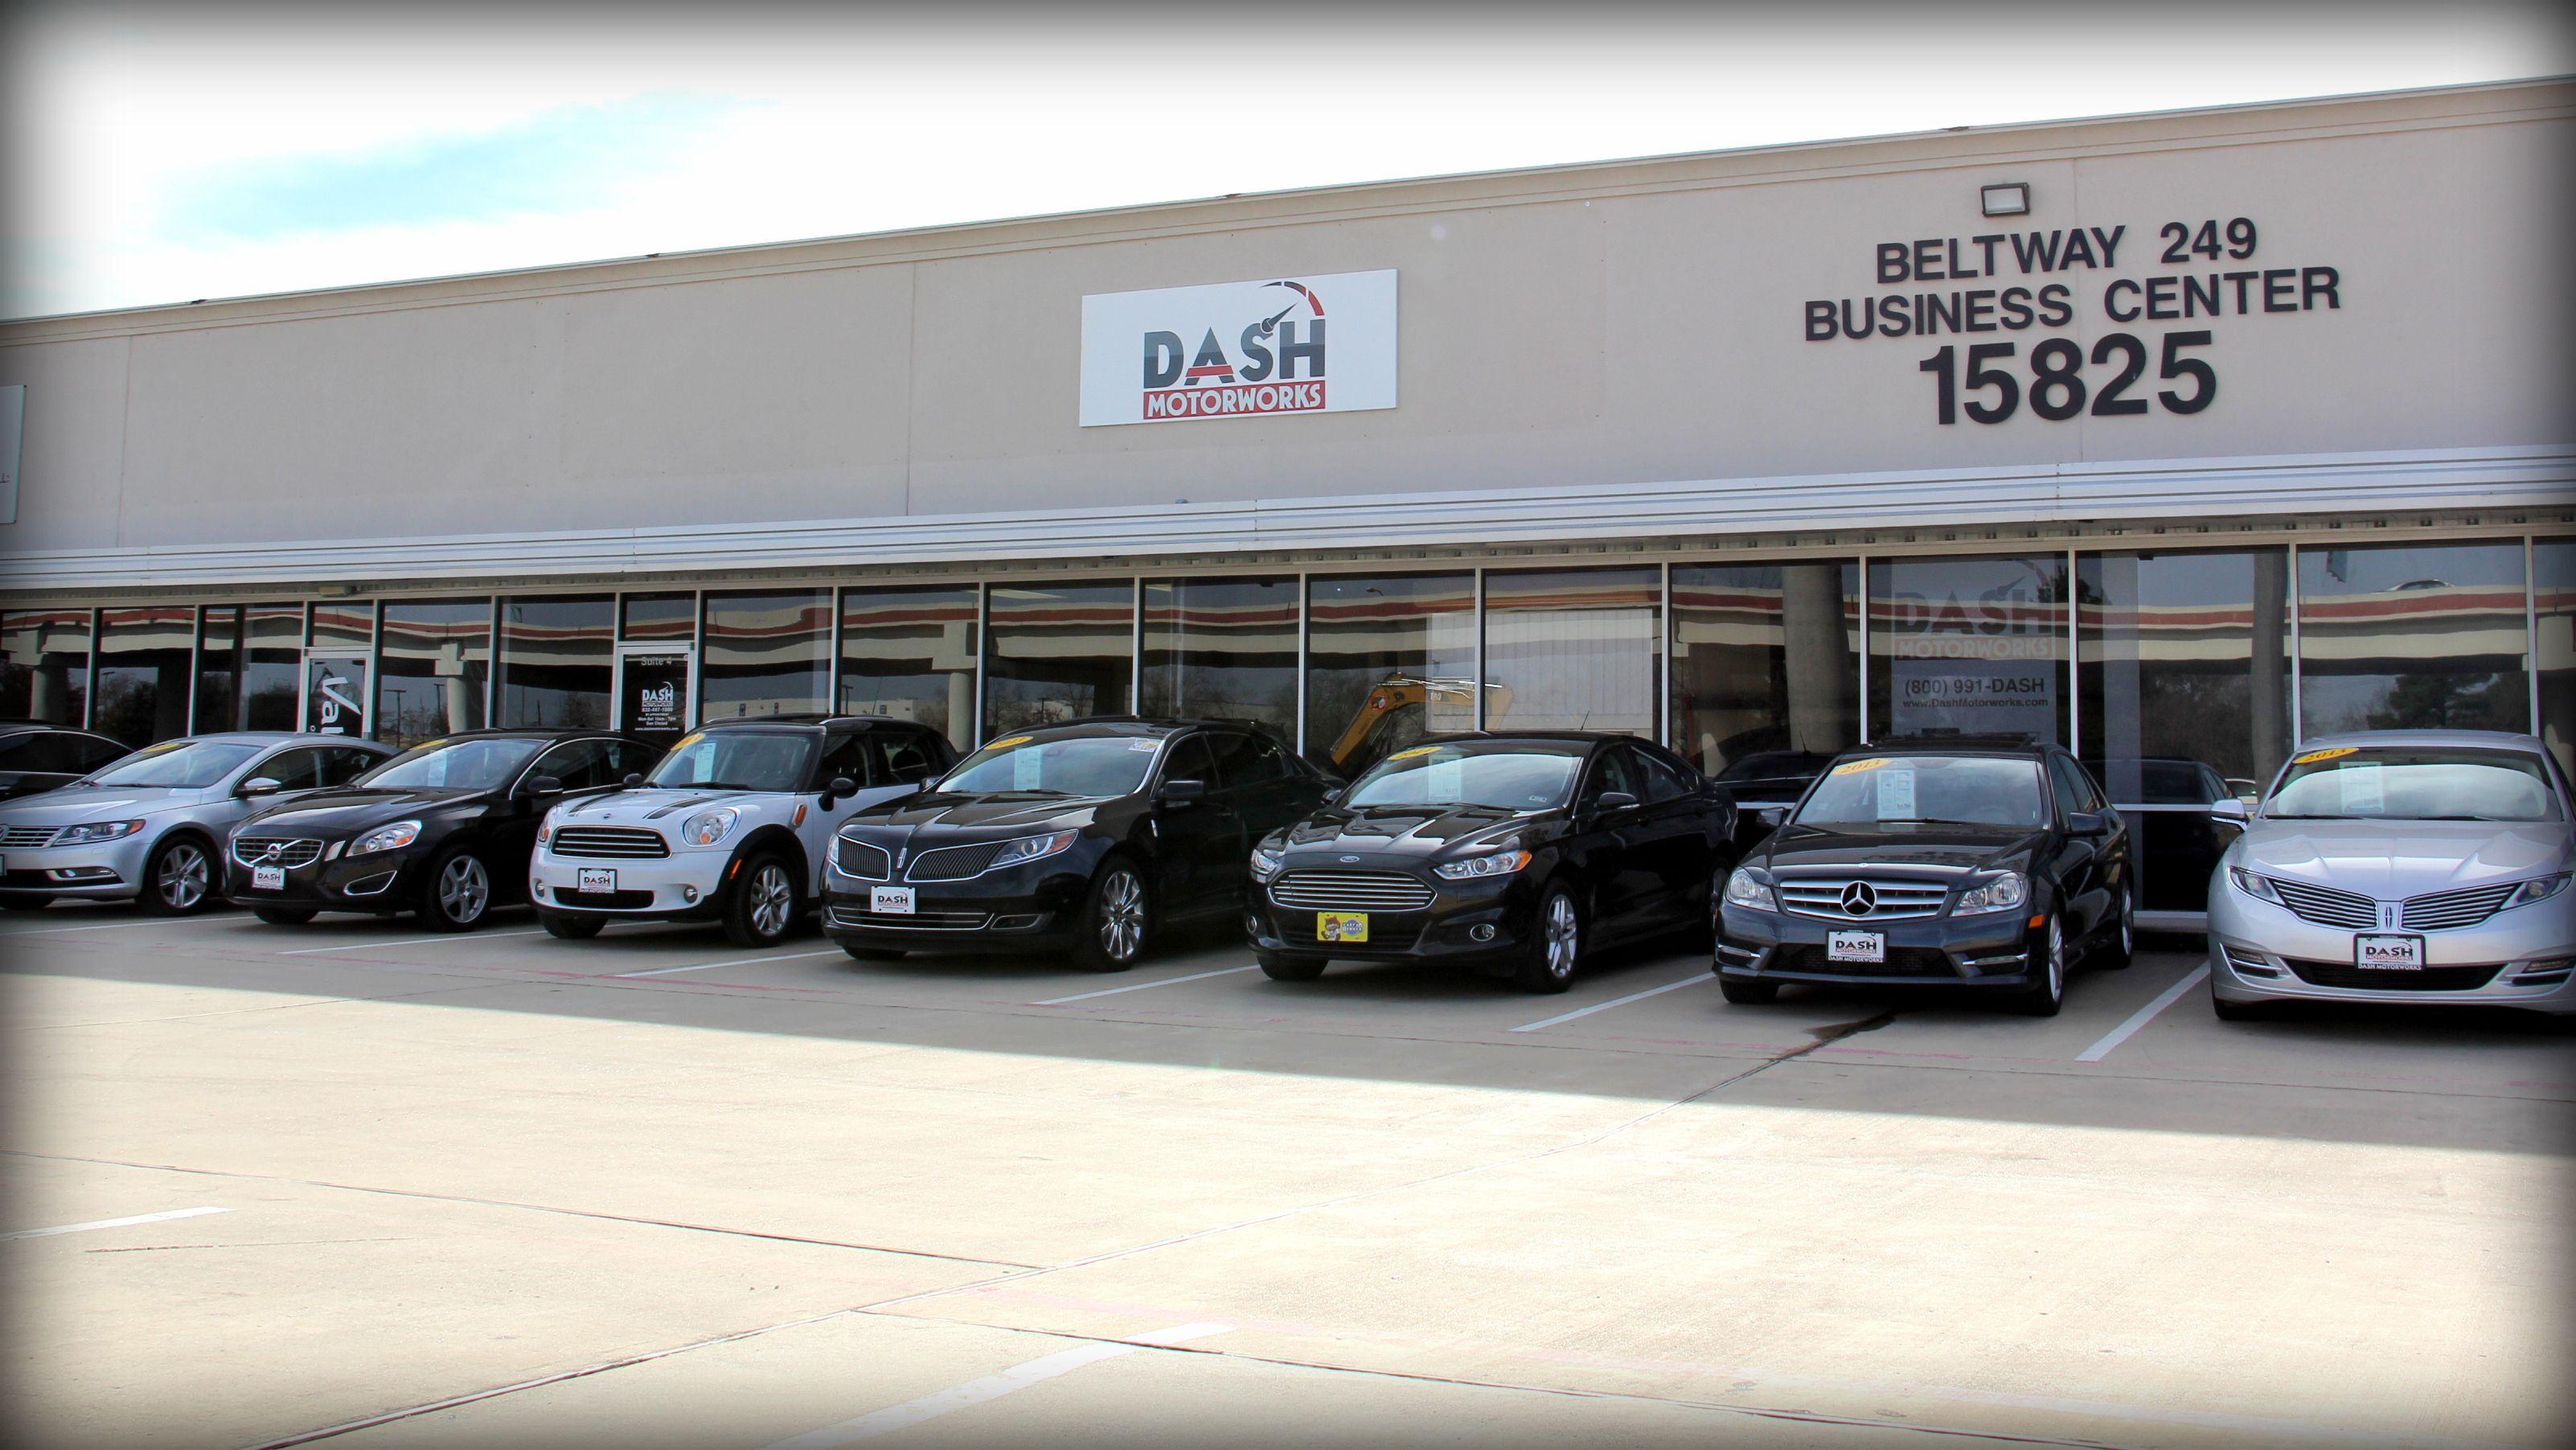 Dash Motorworks Pictures Photo Dash Pictures